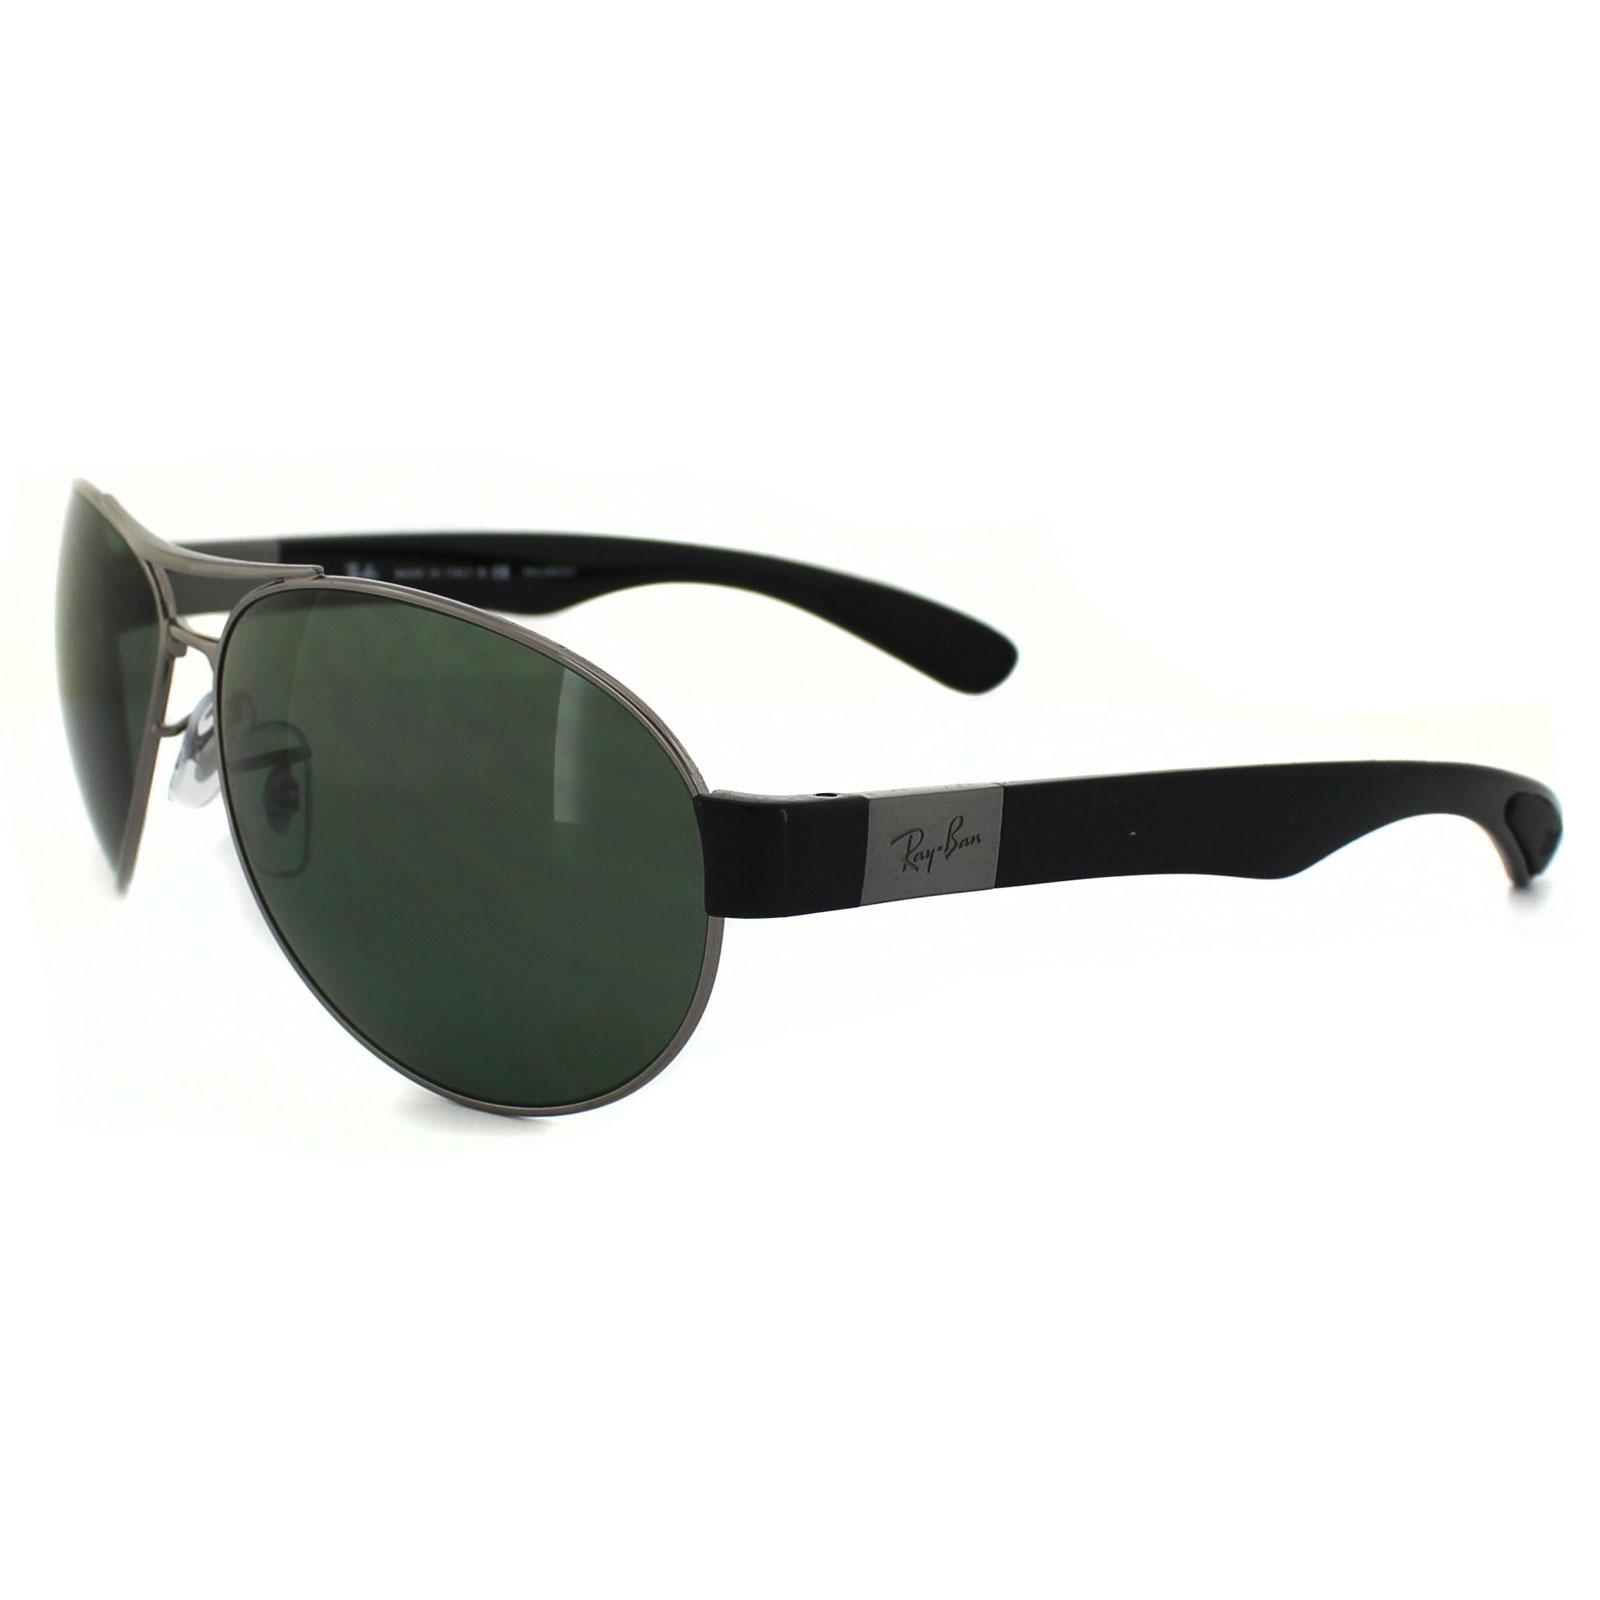 mens sunglasses aviator style photo - 1